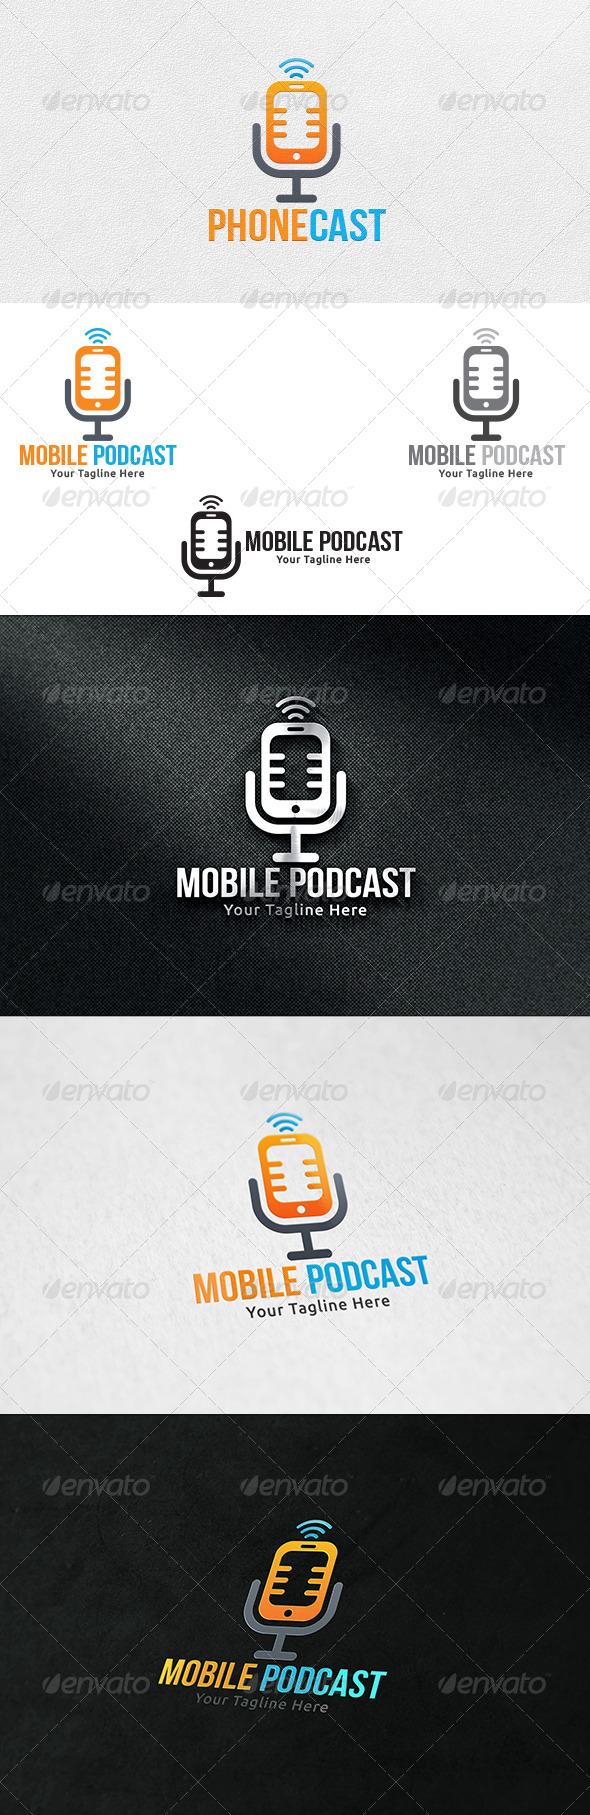 GraphicRiver Mobile Podcast Logo Template 6556932